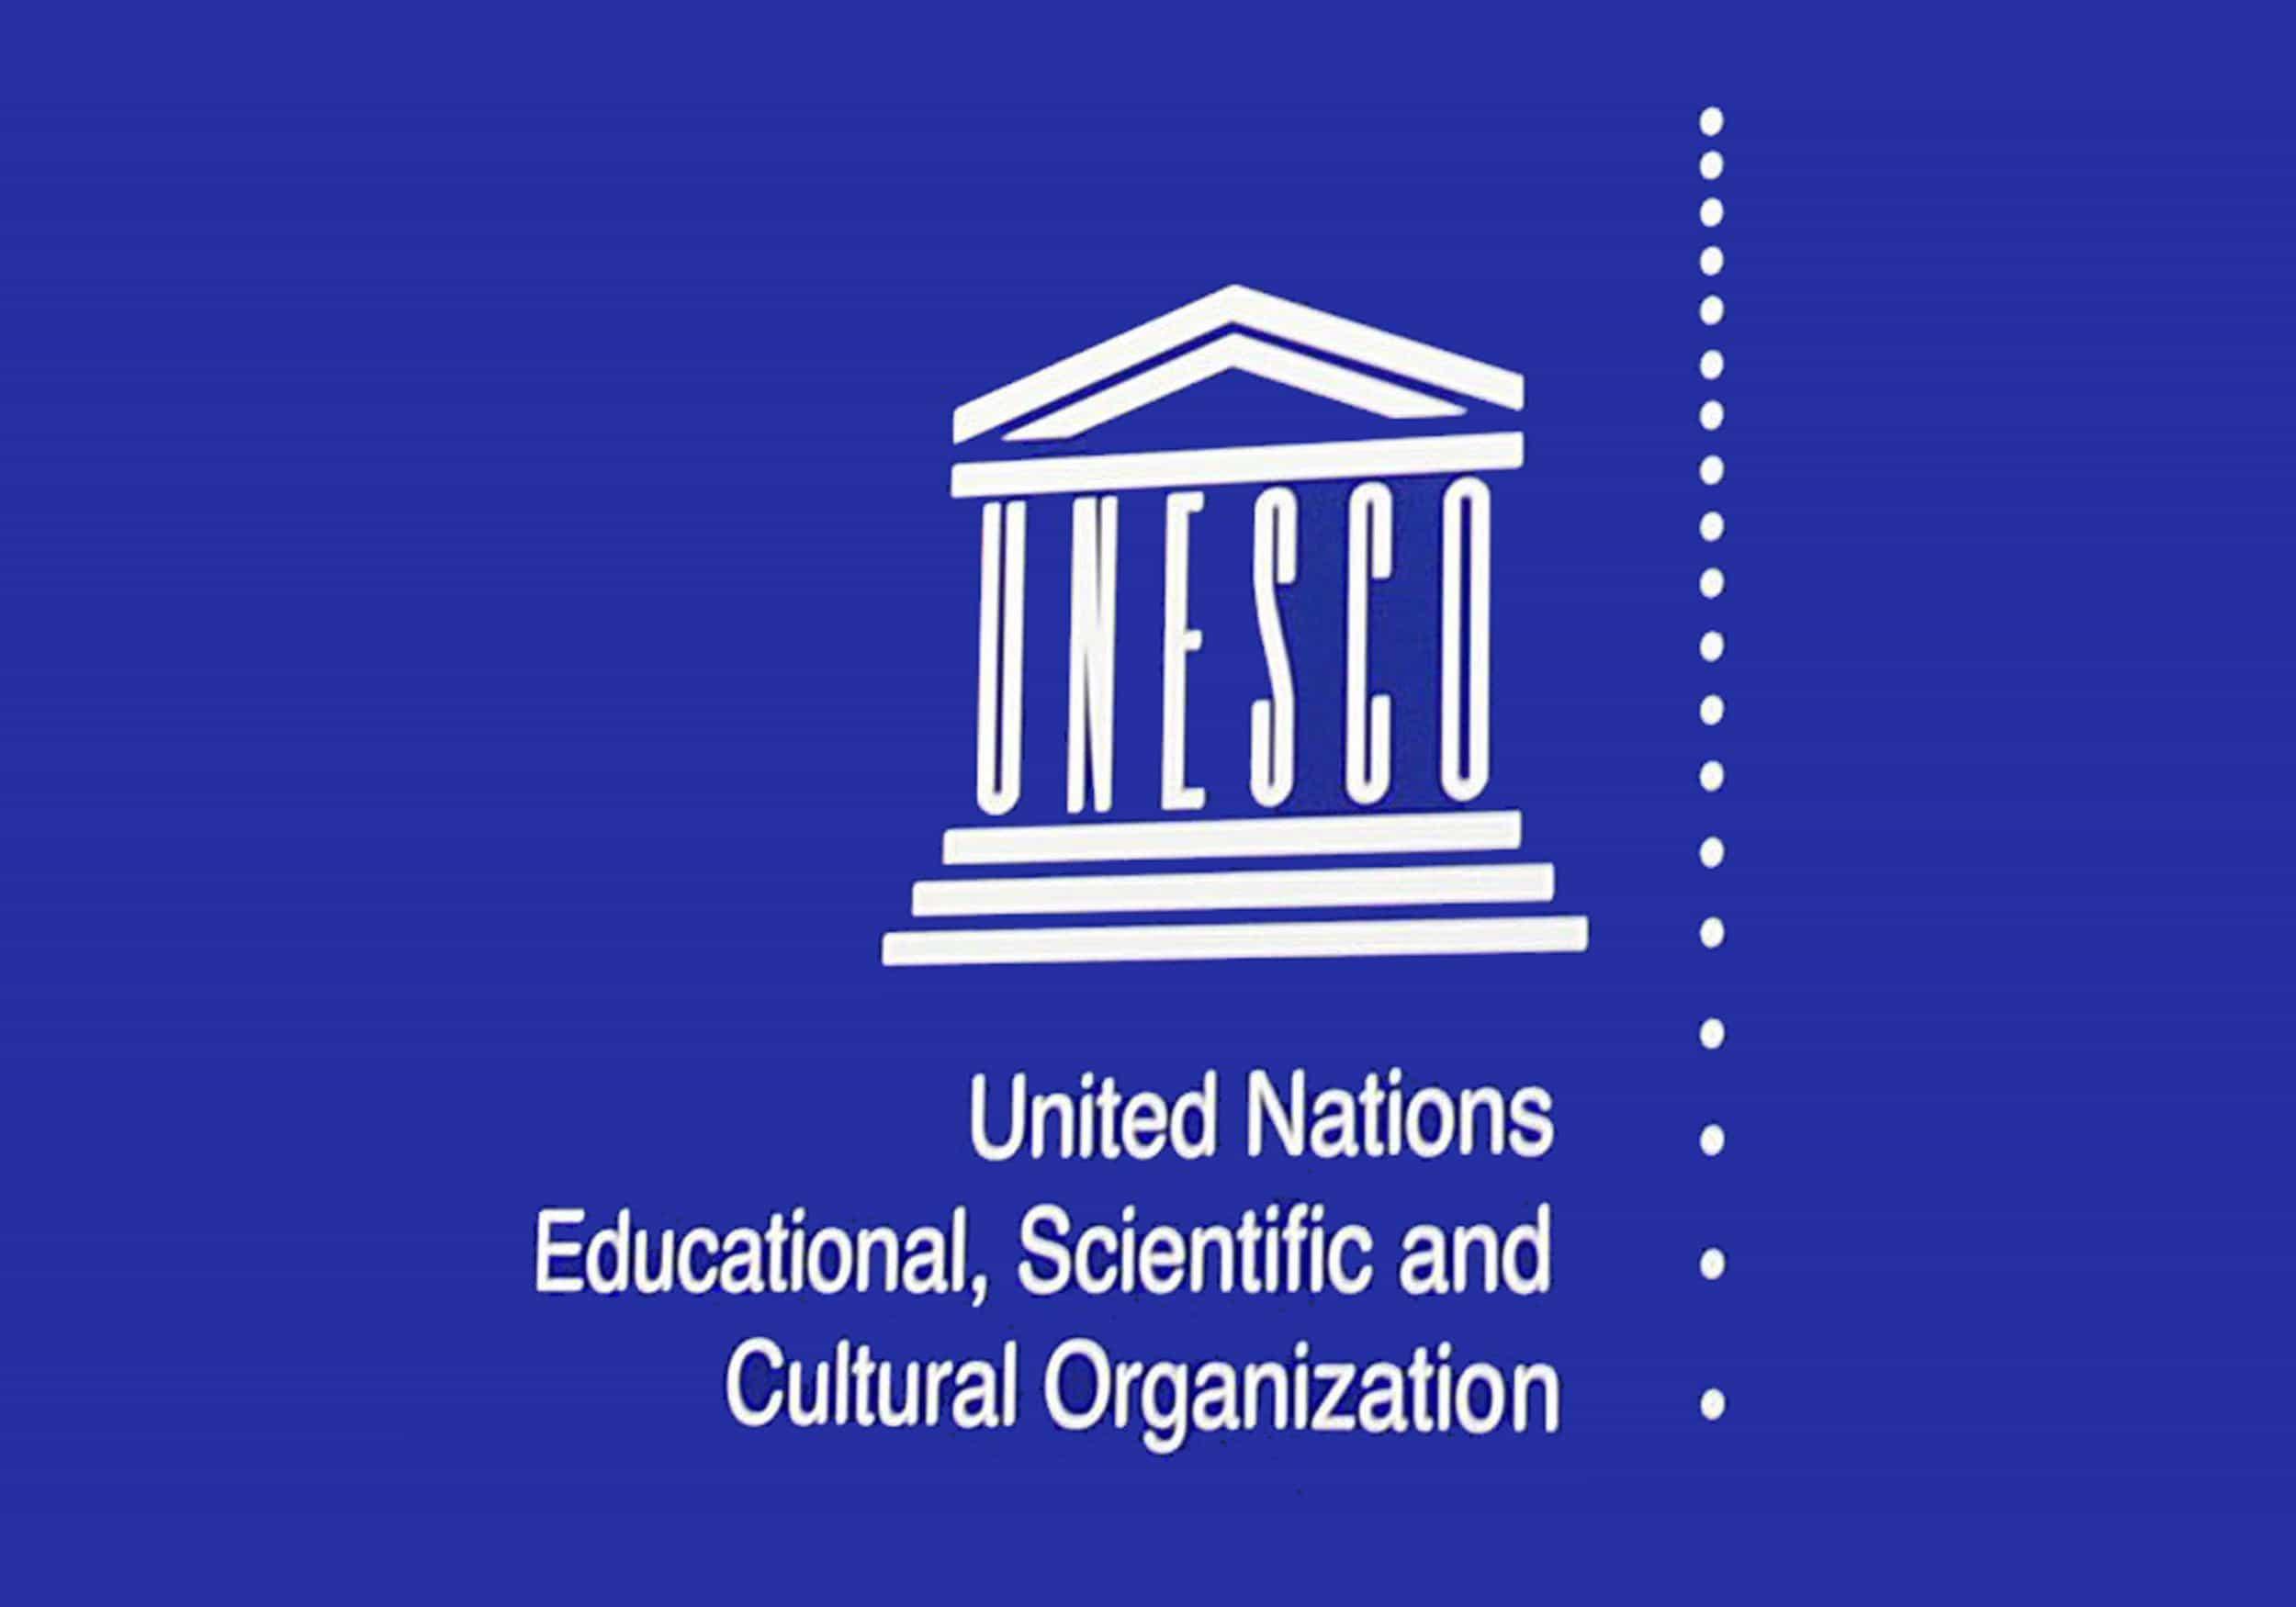 Estados Unidos e Israel efetivam saída da UNESCO